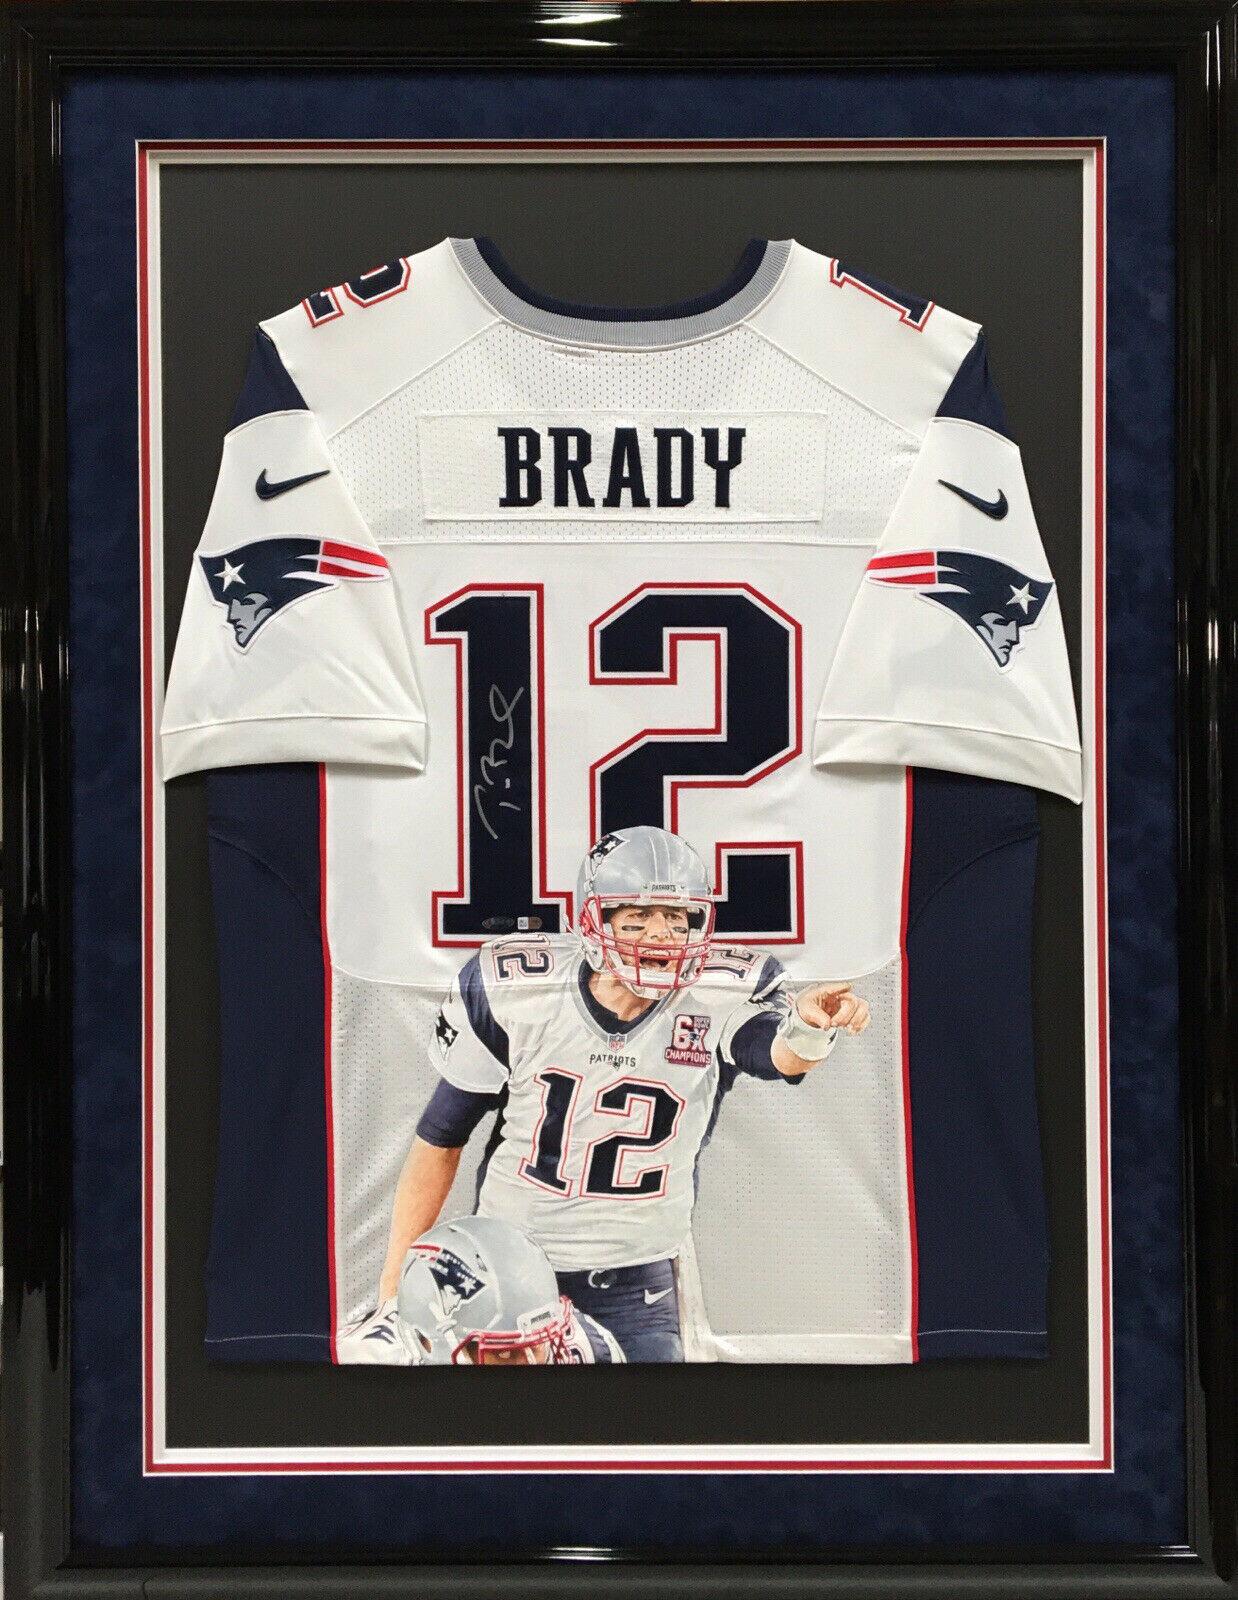 Tom Brady Signed/Framed Hand Painted Jersey *6x SB Champions* Fanatics/Tri-Star